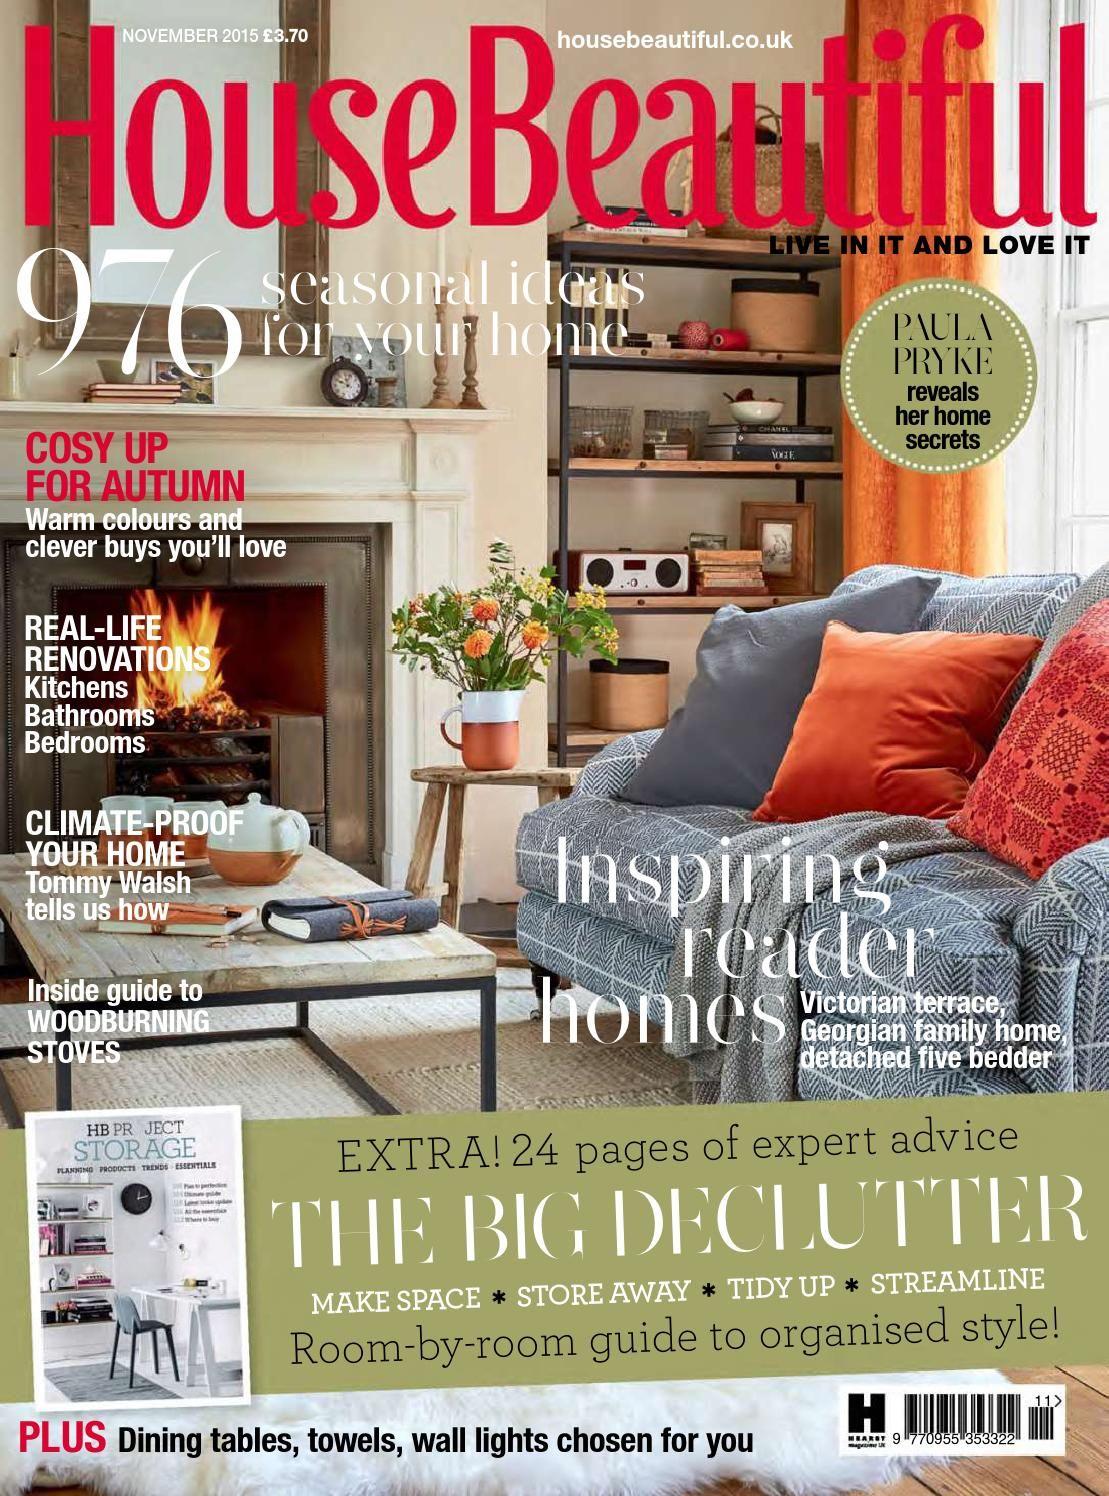 House Beautiful Magazine Issuu  House Beautiful November 2015Niko  Уютный Дом